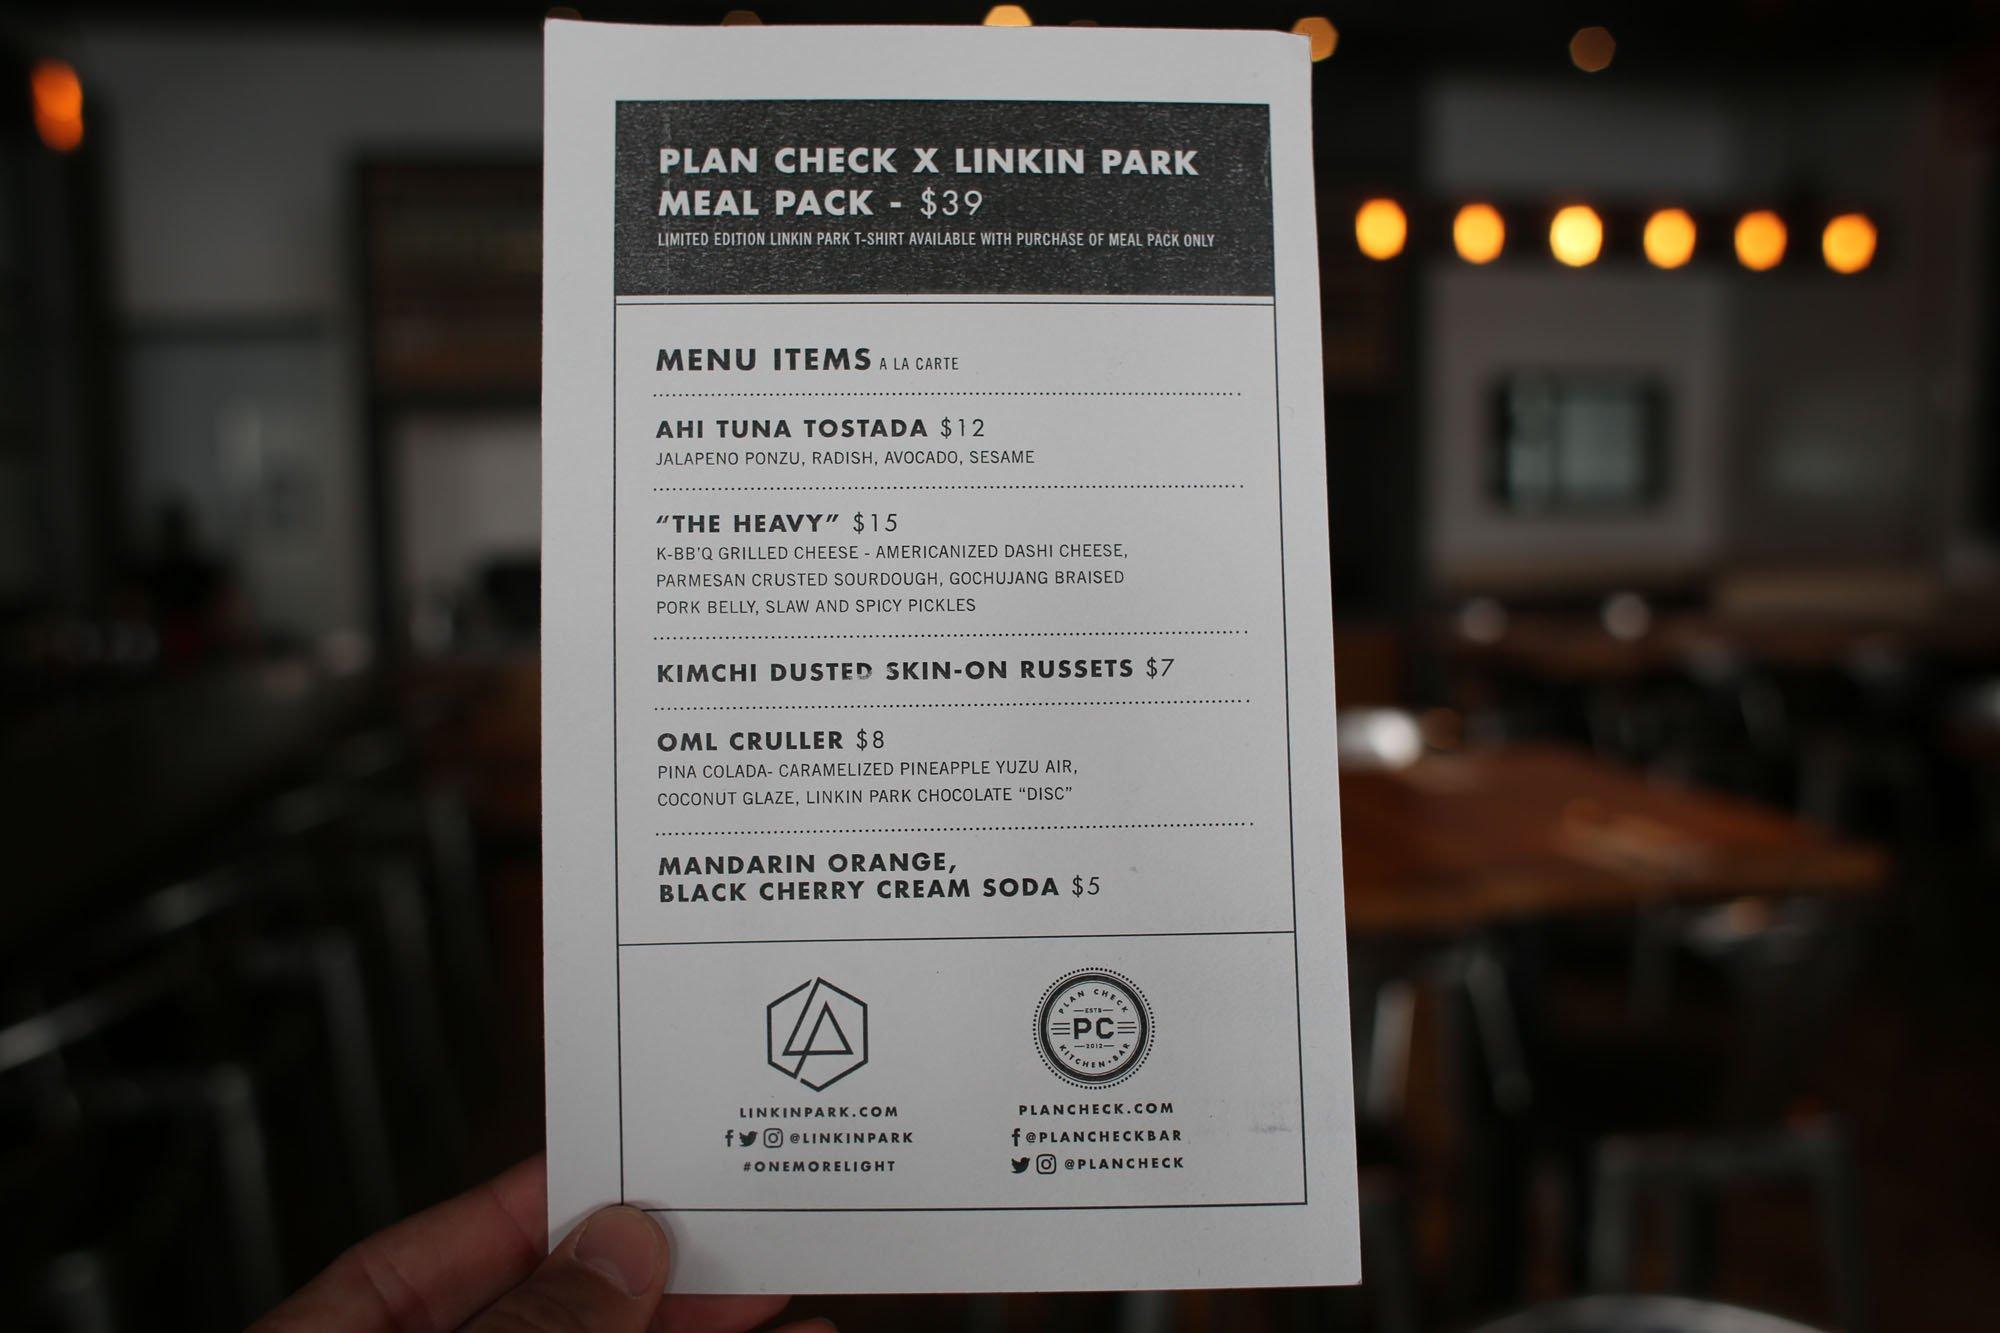 .@LinkinPark Has a Killer Meal Pack at @PlanCheck https://t.co/KiLI2azn4I https://t.co/HjAOFkOqJ0